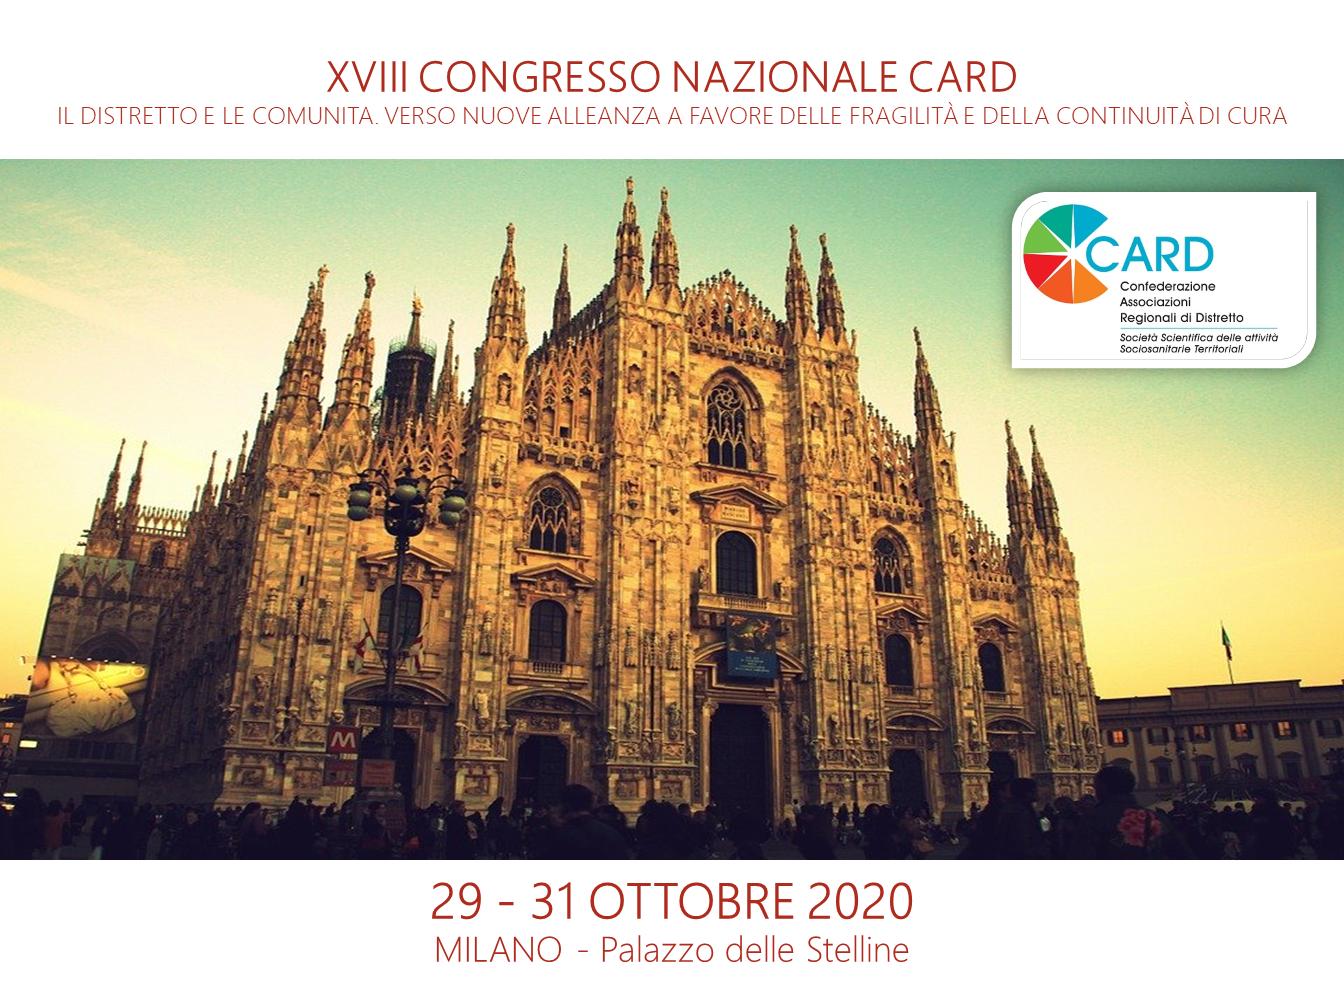 CARD OTTOBRE 2020